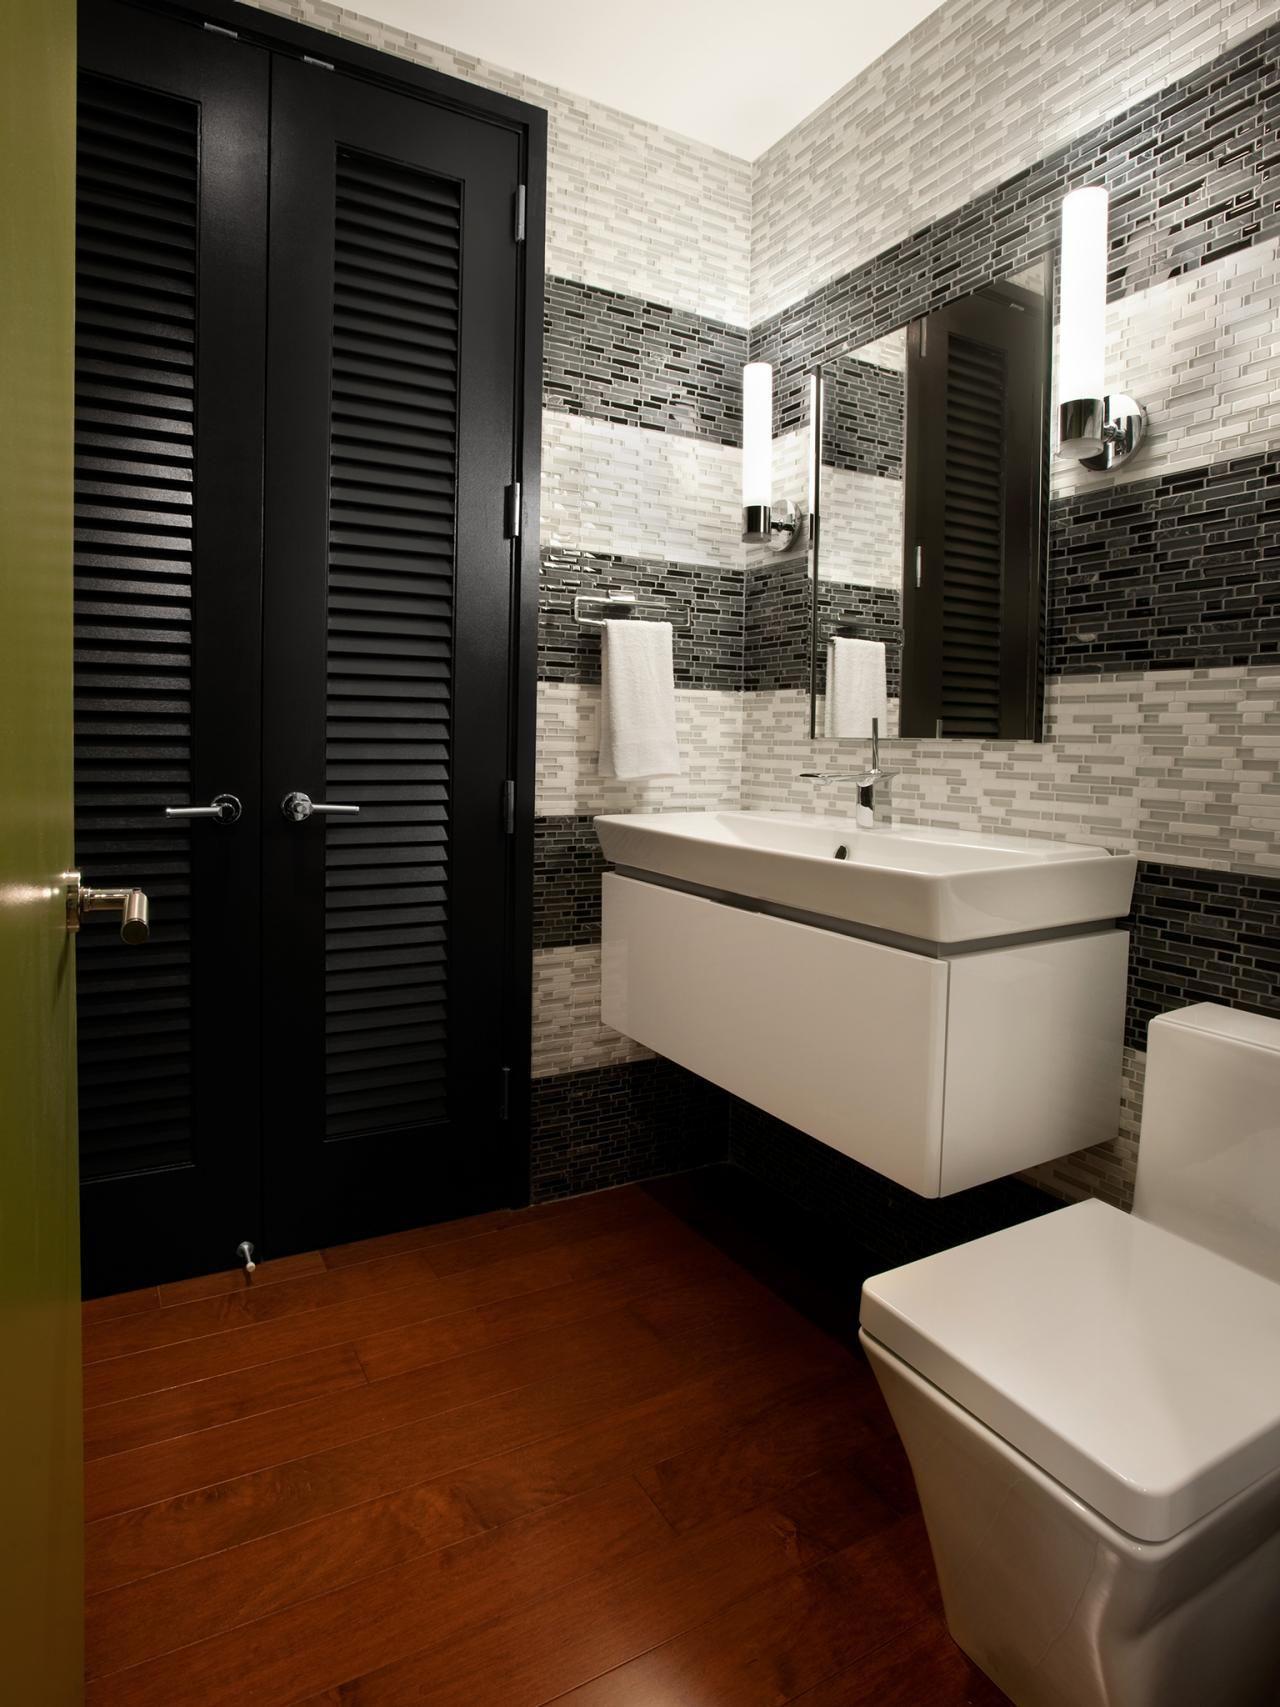 HGTVRemodelsu0027 Bathroom Planning Guide Walks You Through All Aspects Of A  Bathroom Renovation, Including